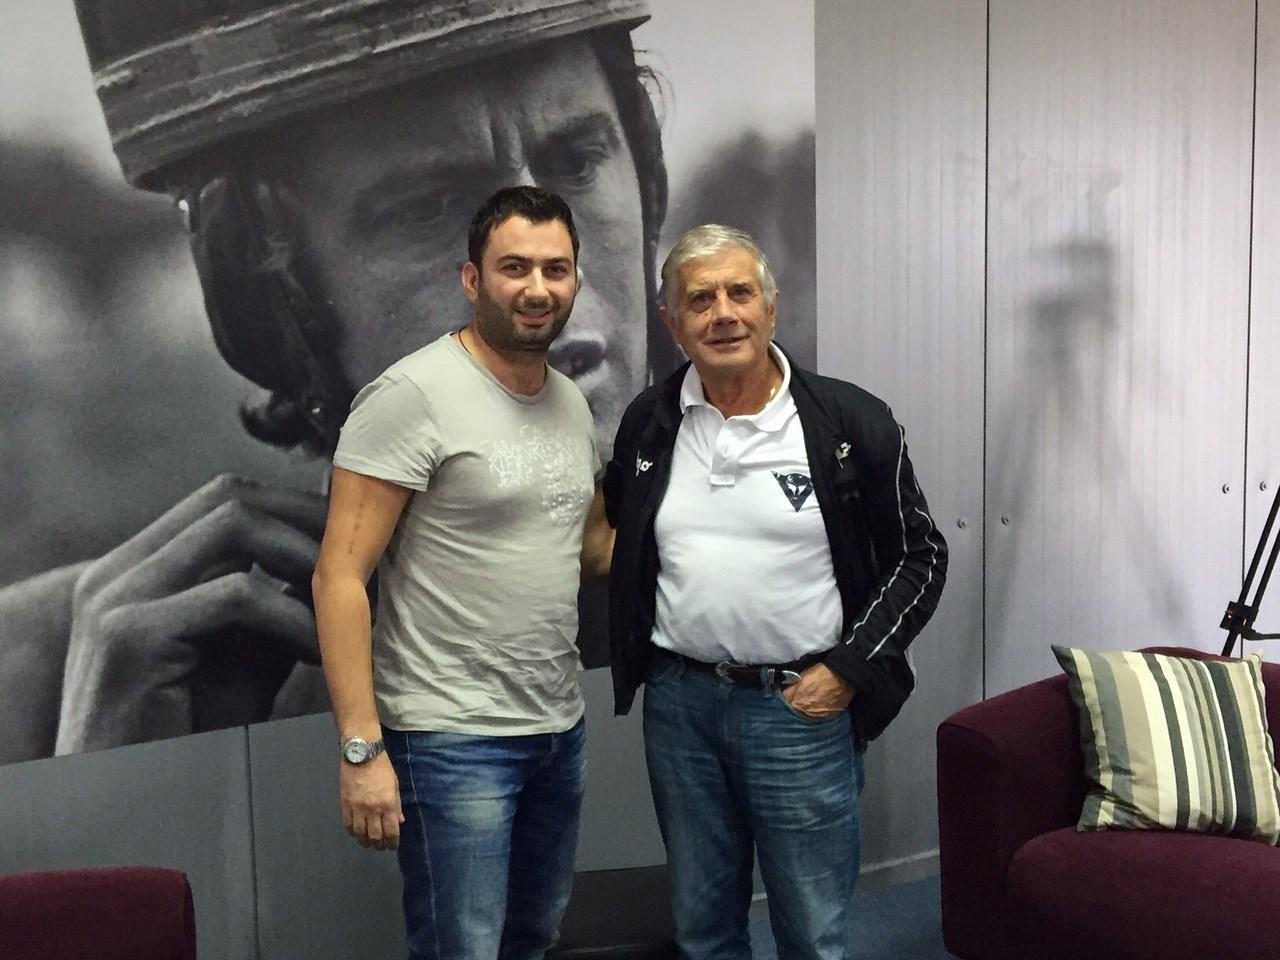 O Βασίλης Σαρημπαλίδης μαζί με τον Giacomo Agostini στο αυτοκινητoδρόμιο της πόλης των Μεγάρων...